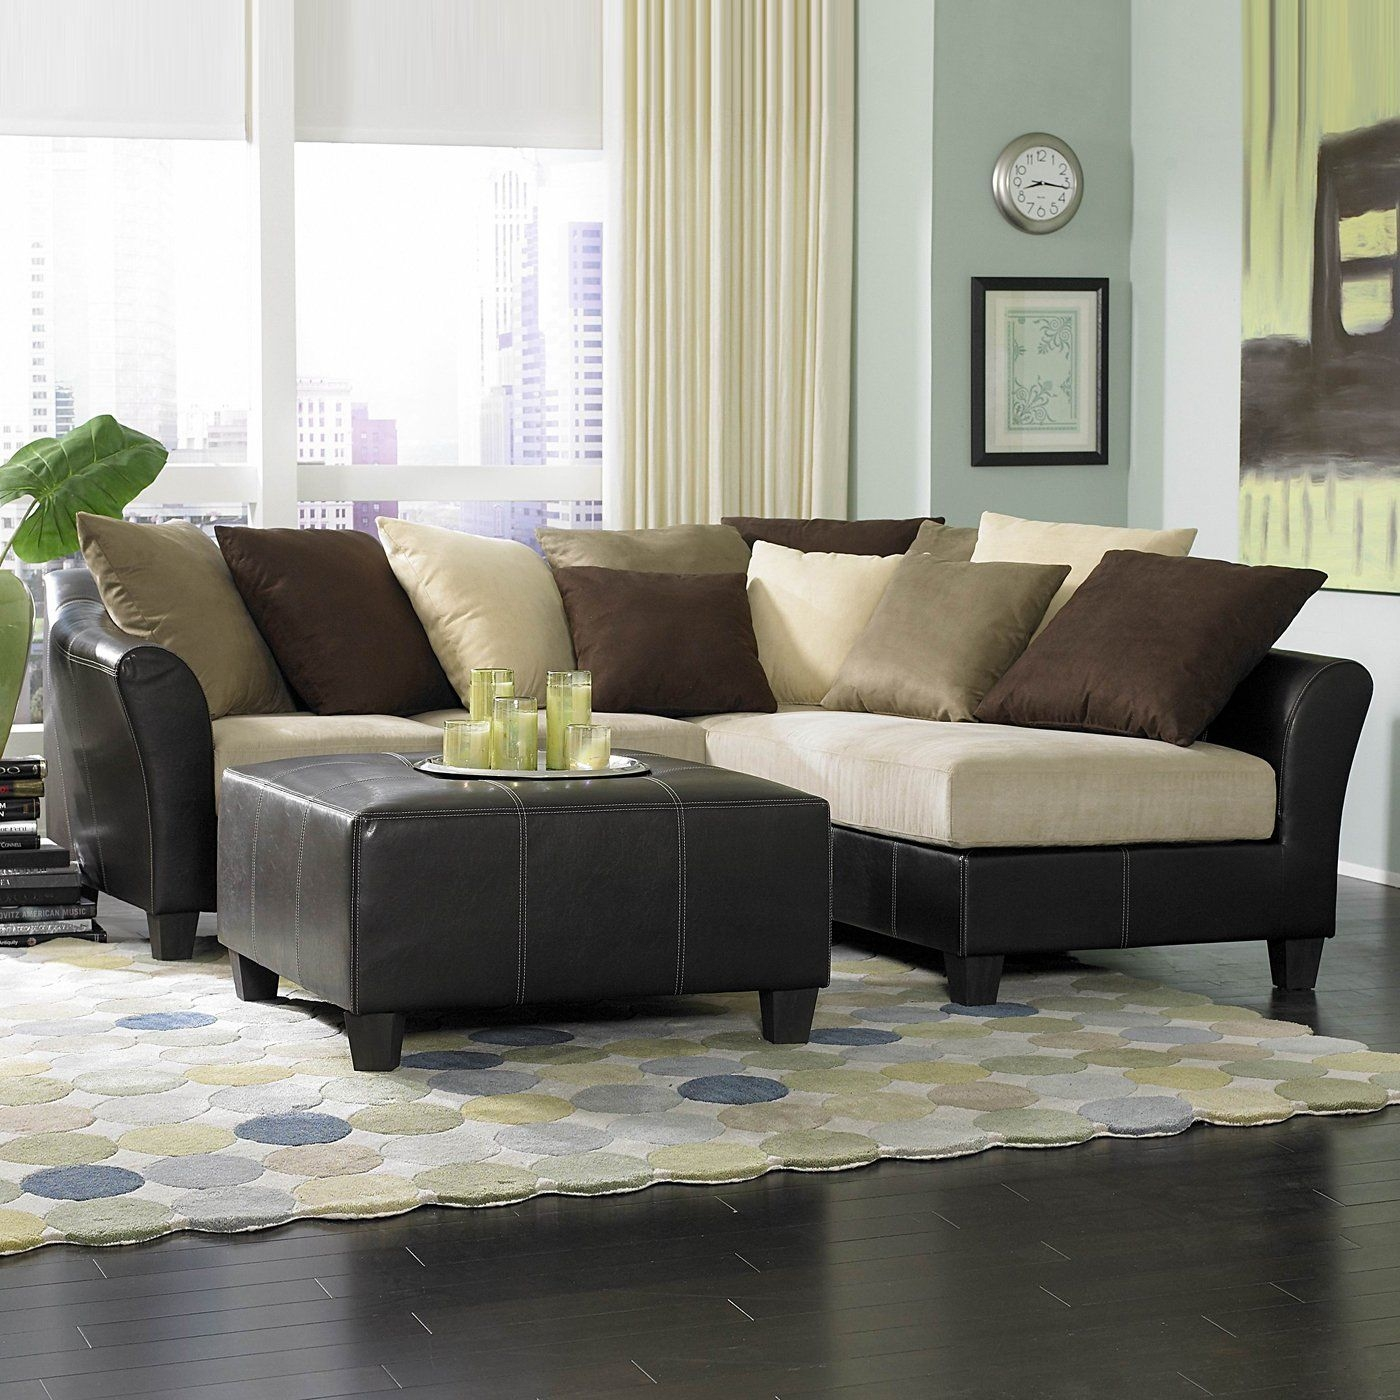 Modern Microfiber Sectional Sofa 2